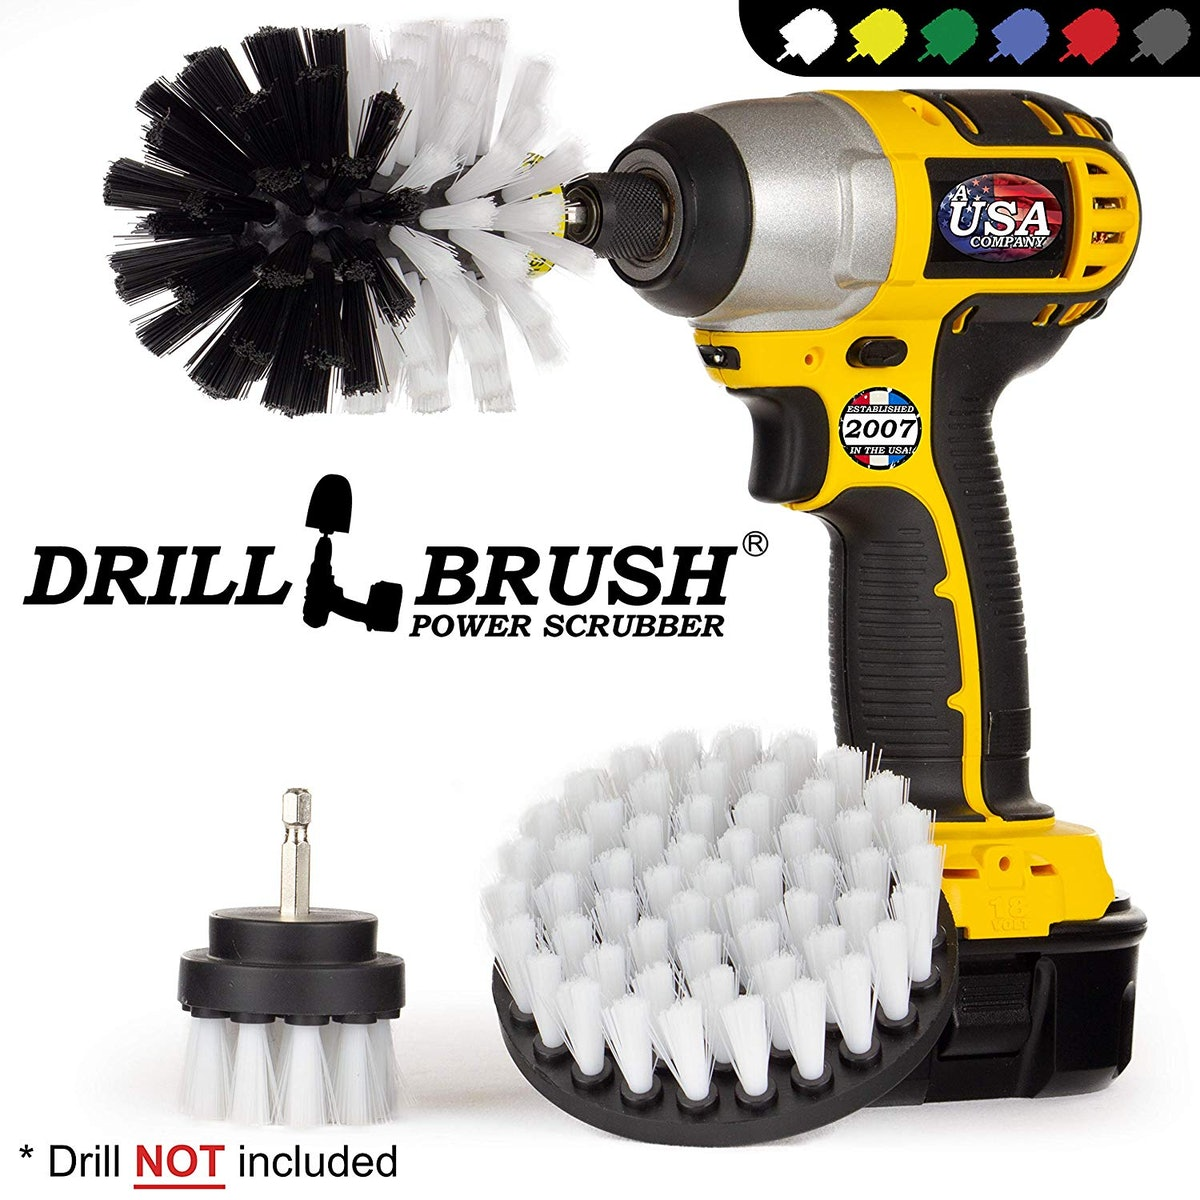 Drillbrush Cleaning Kit (3-Piece Set)